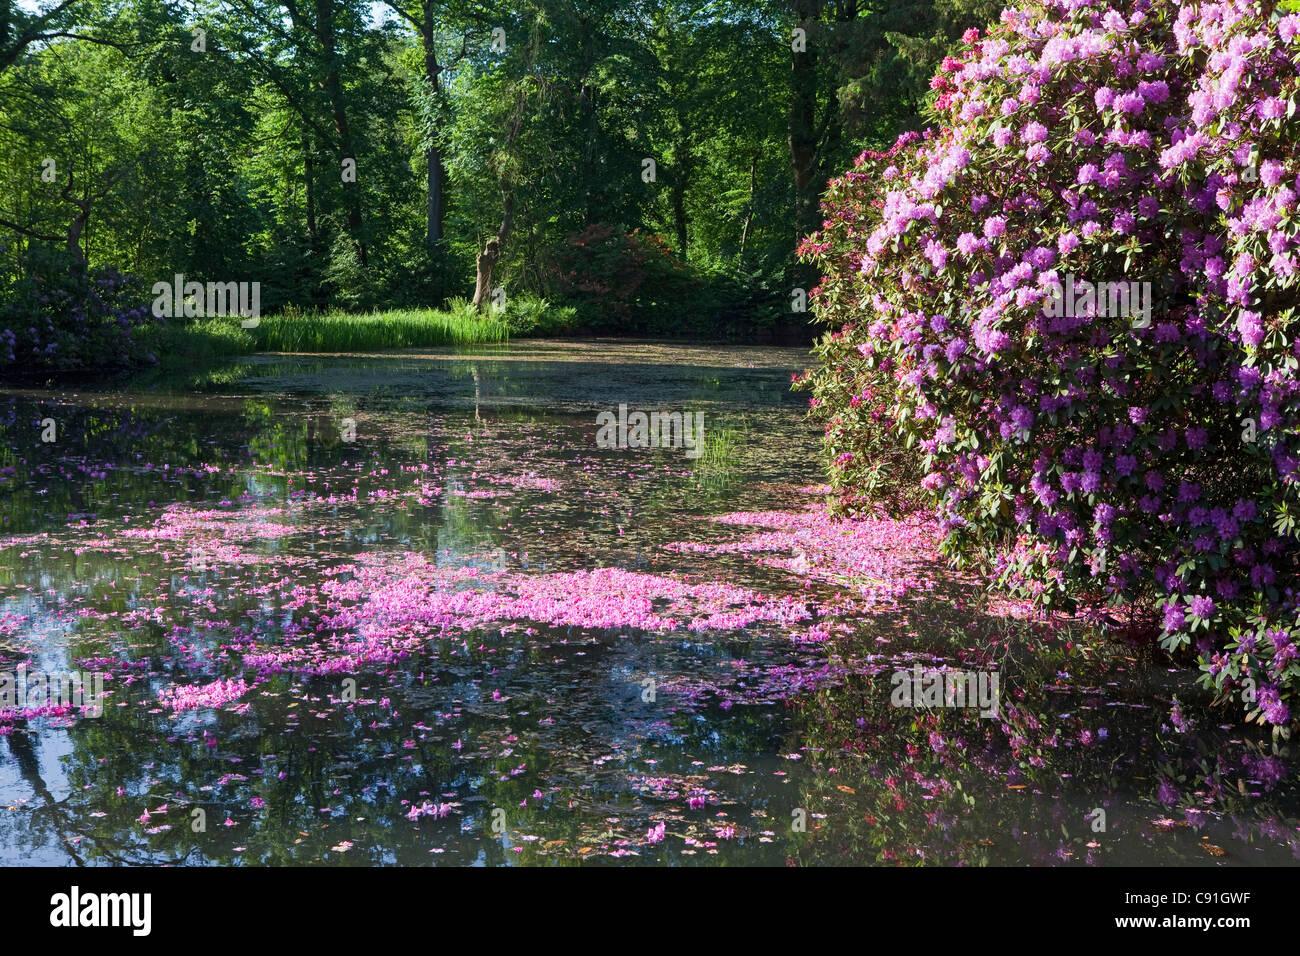 Pink rhododendron petals floating in the water, landscape garden, Breidings garden, Soltau, Lower Saxony, Germany - Stock Image